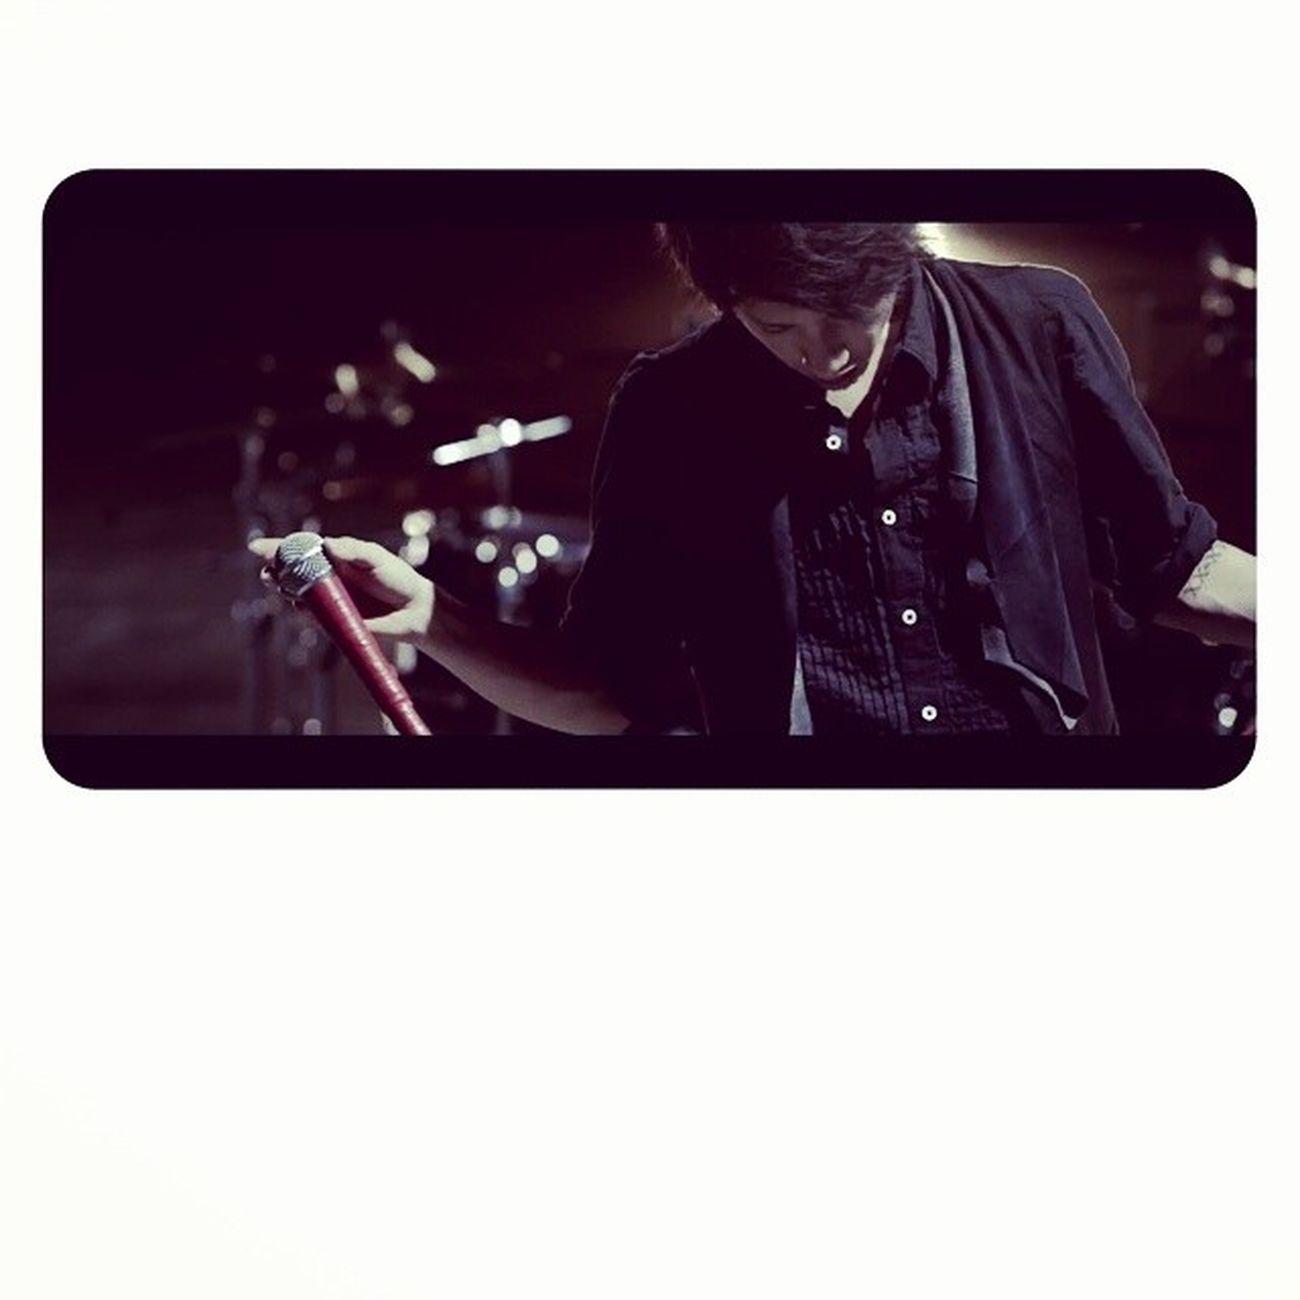 New PV finally released ~ OOR Oricon ONEOKROCK Japan rocknroll ryota taka tomoya toru band japan mightylongfall redmic filter foto cometotaiwan 京都大火編 玩圖 什麼時候再來台灣